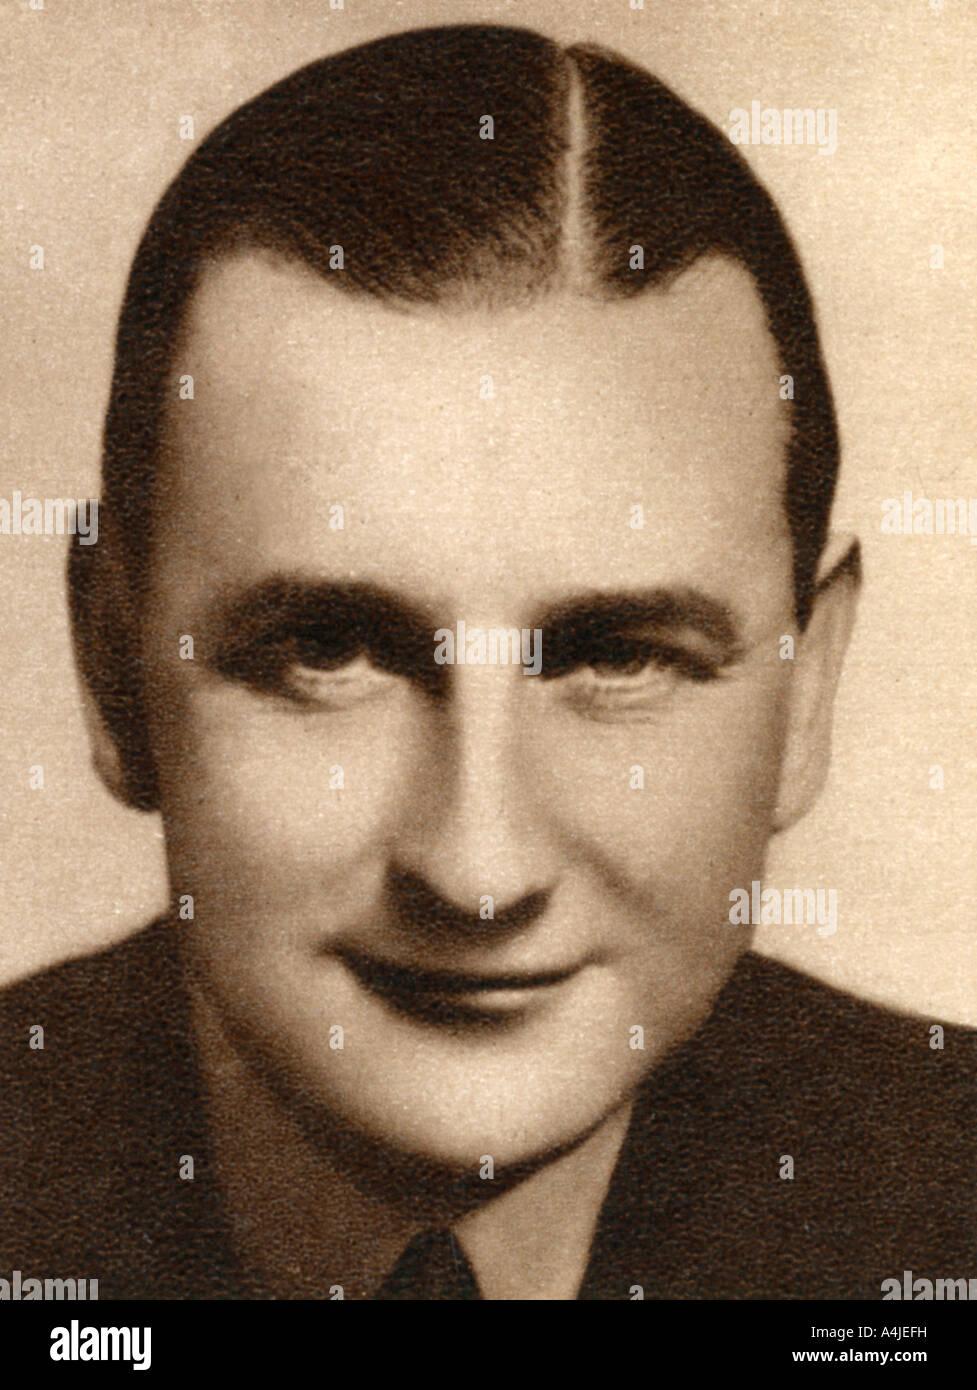 Herbert Wilcox British film producer 1933  - Stock Image